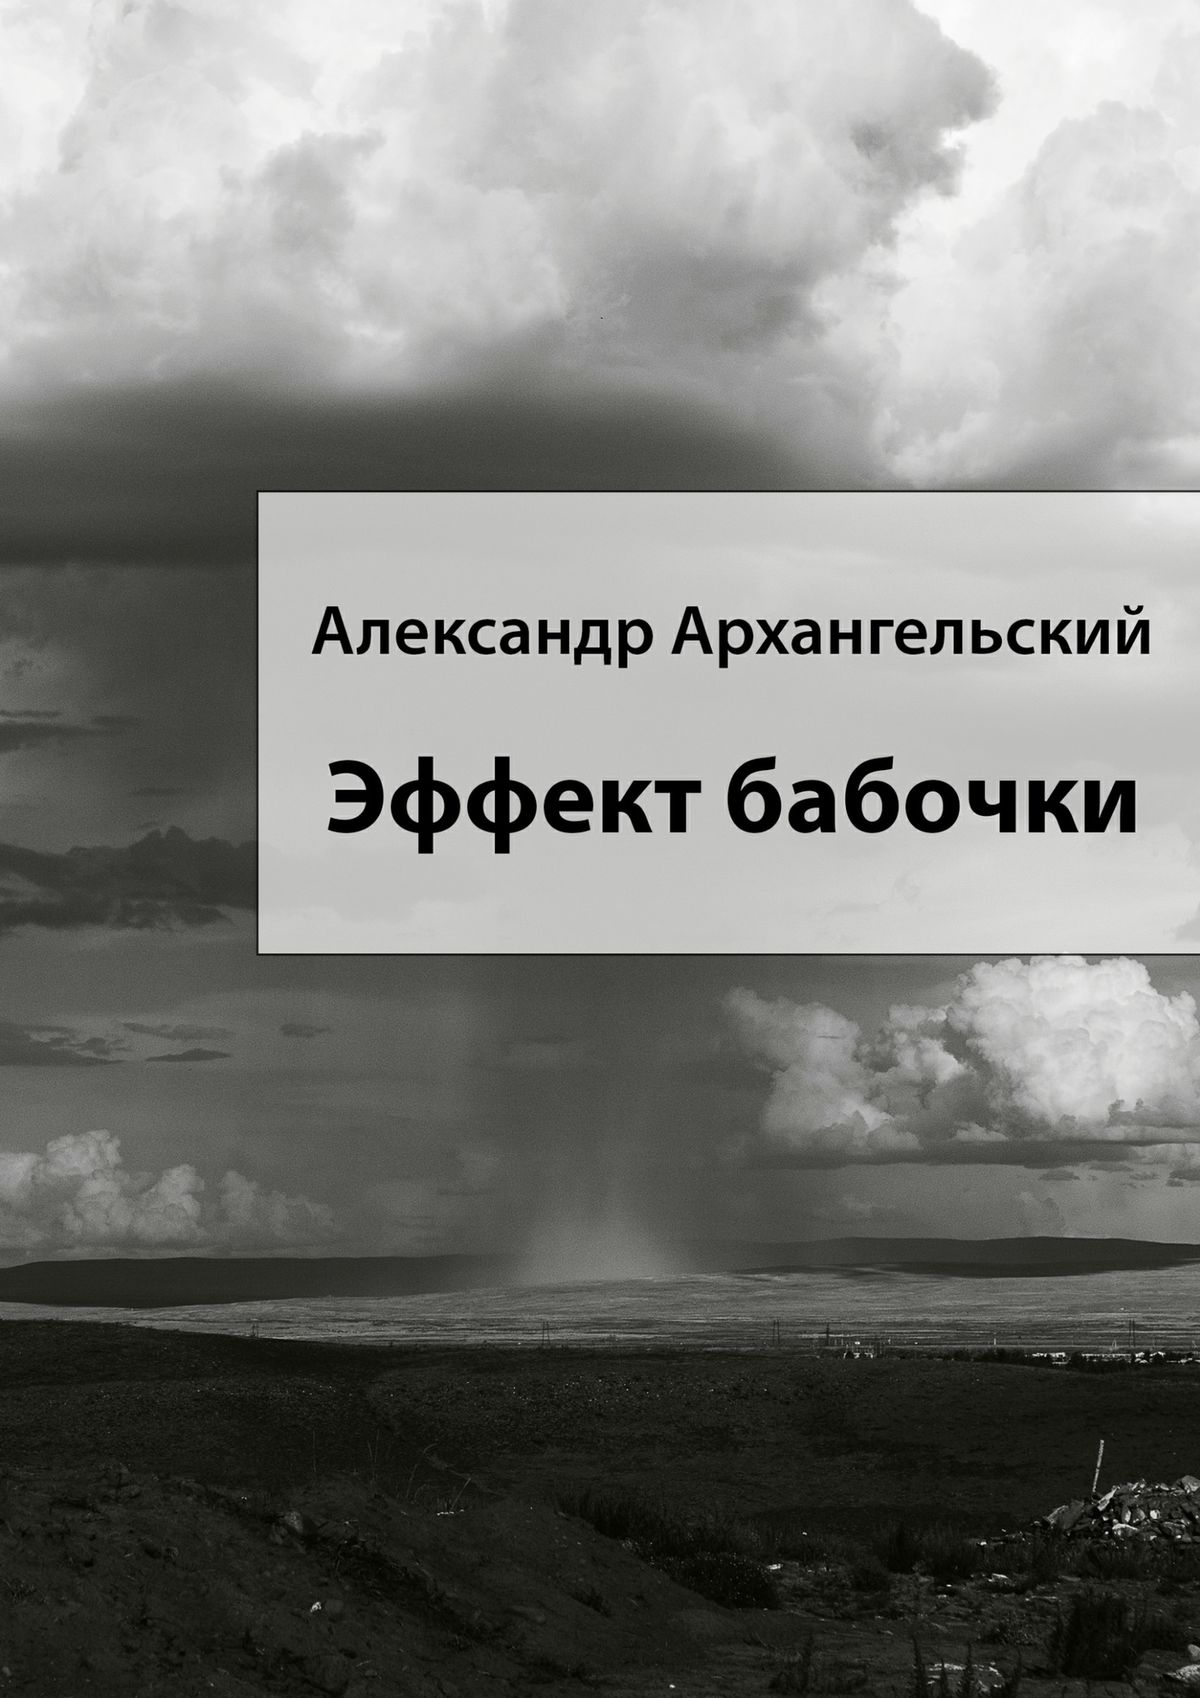 цена Александр Архангельский Эффект бабочки